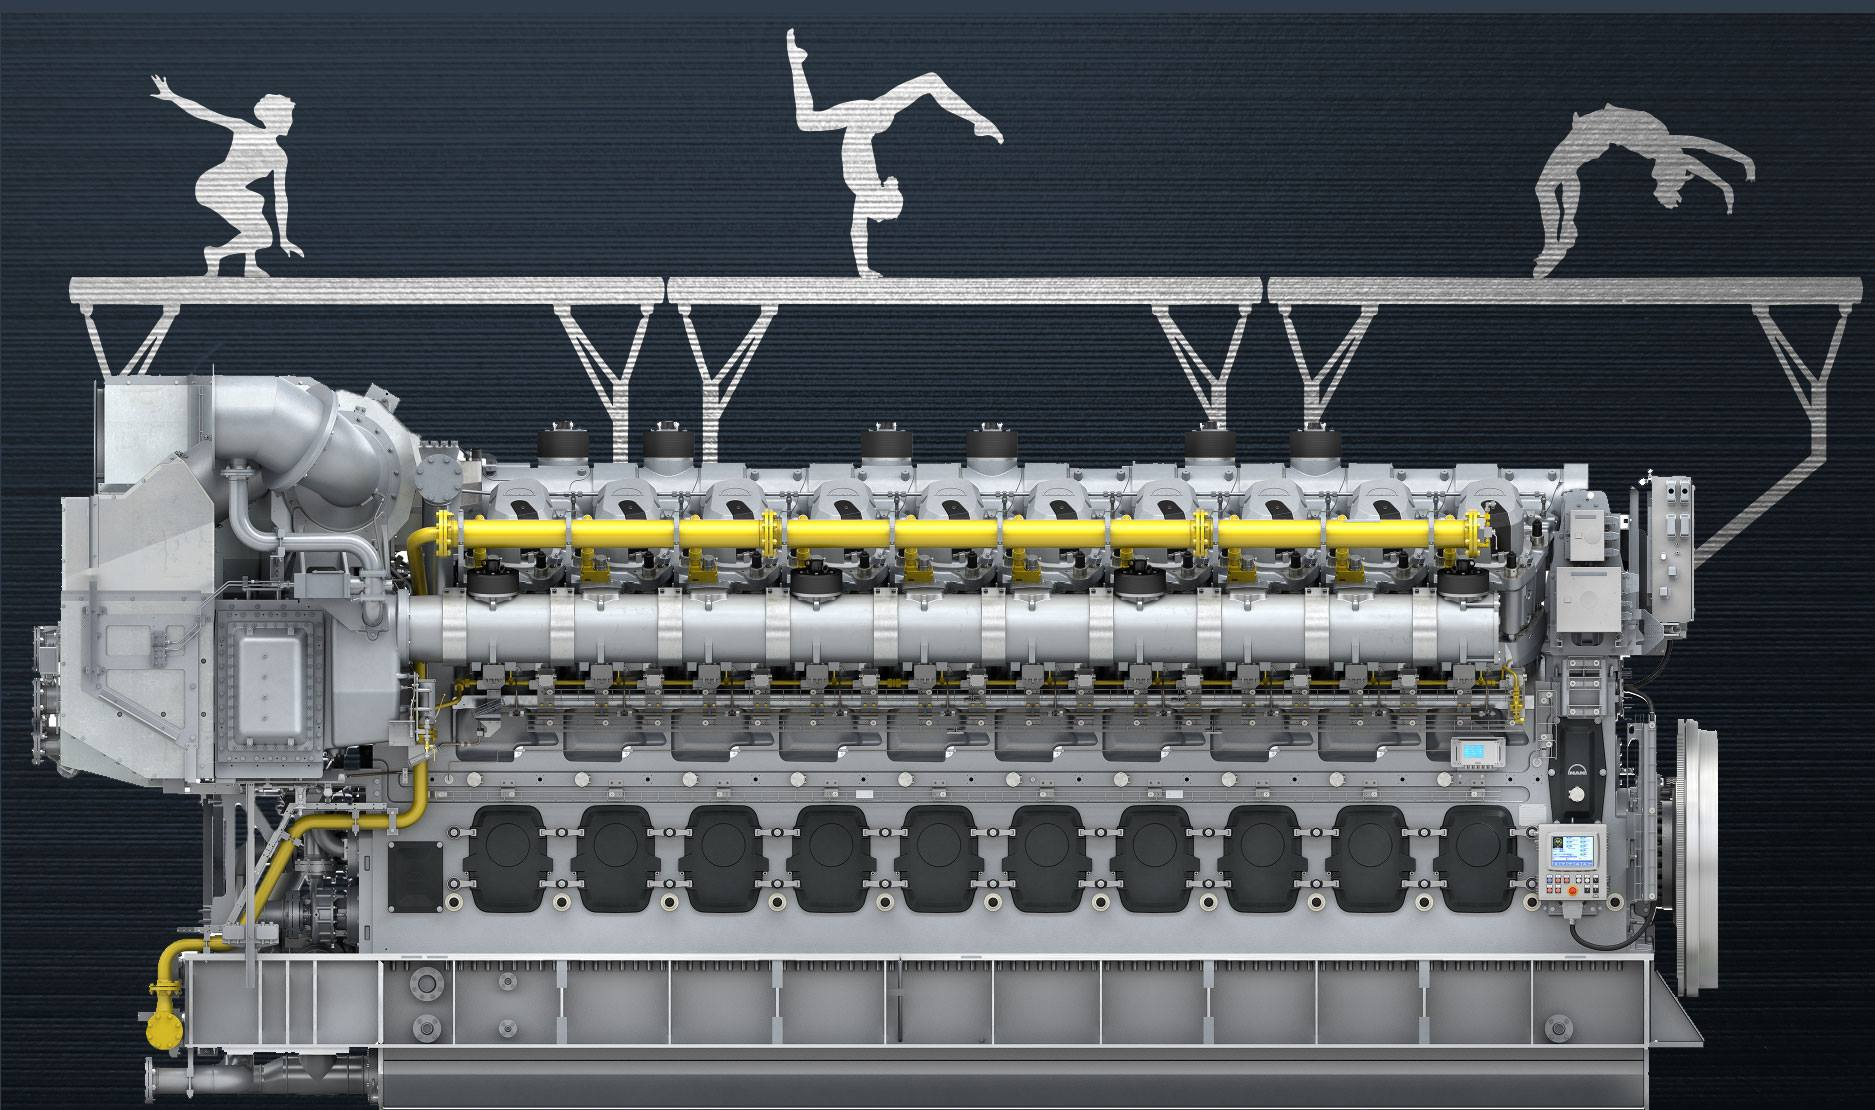 MAN builds district heating power plant for EnBW in Stuttgart